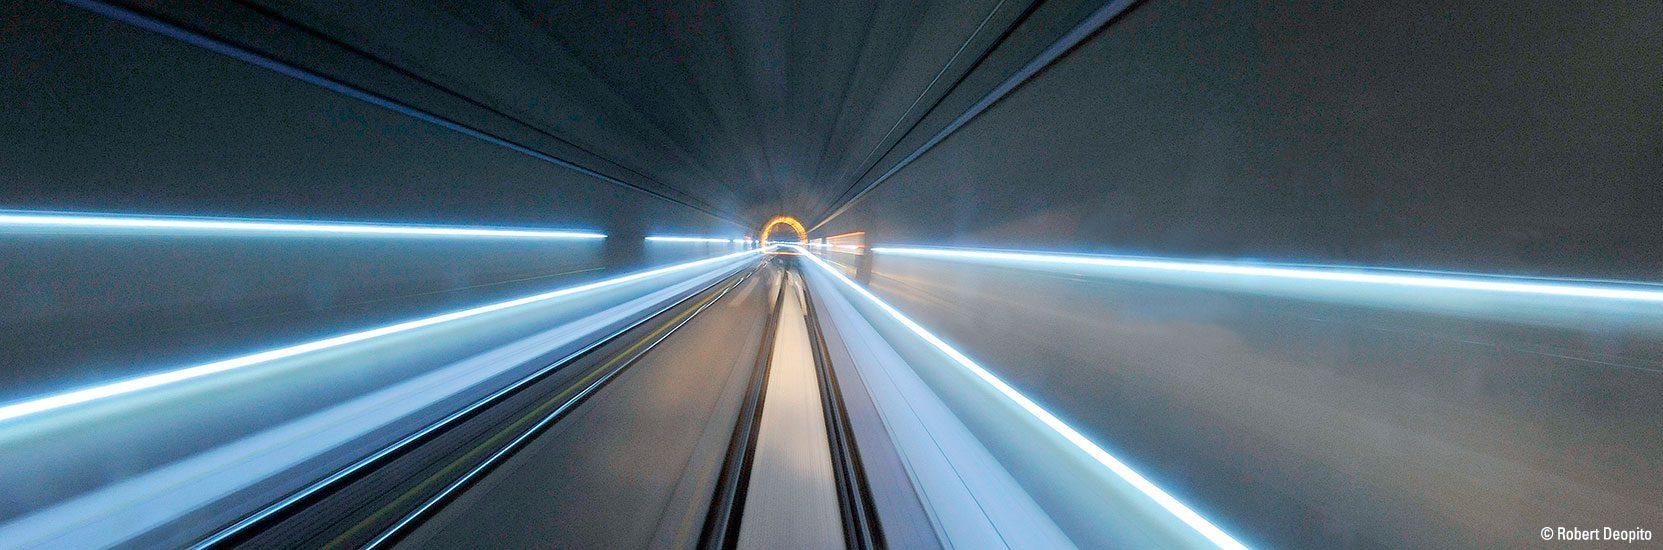 Barbarossatunnel, B 10, Umfahrung Annweiler: DAUB